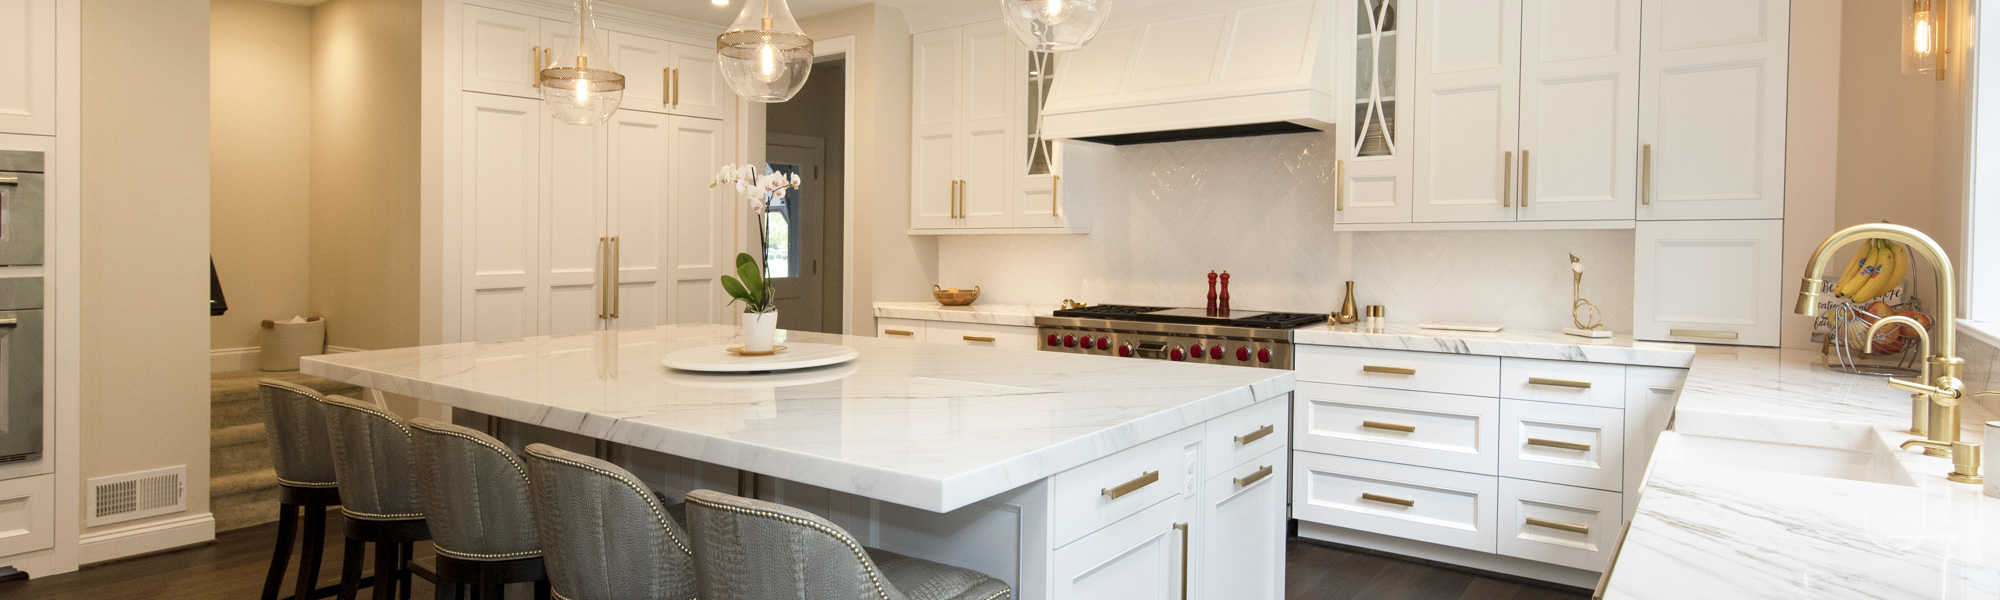 whole-house-renovation-in-Great Falls-VA